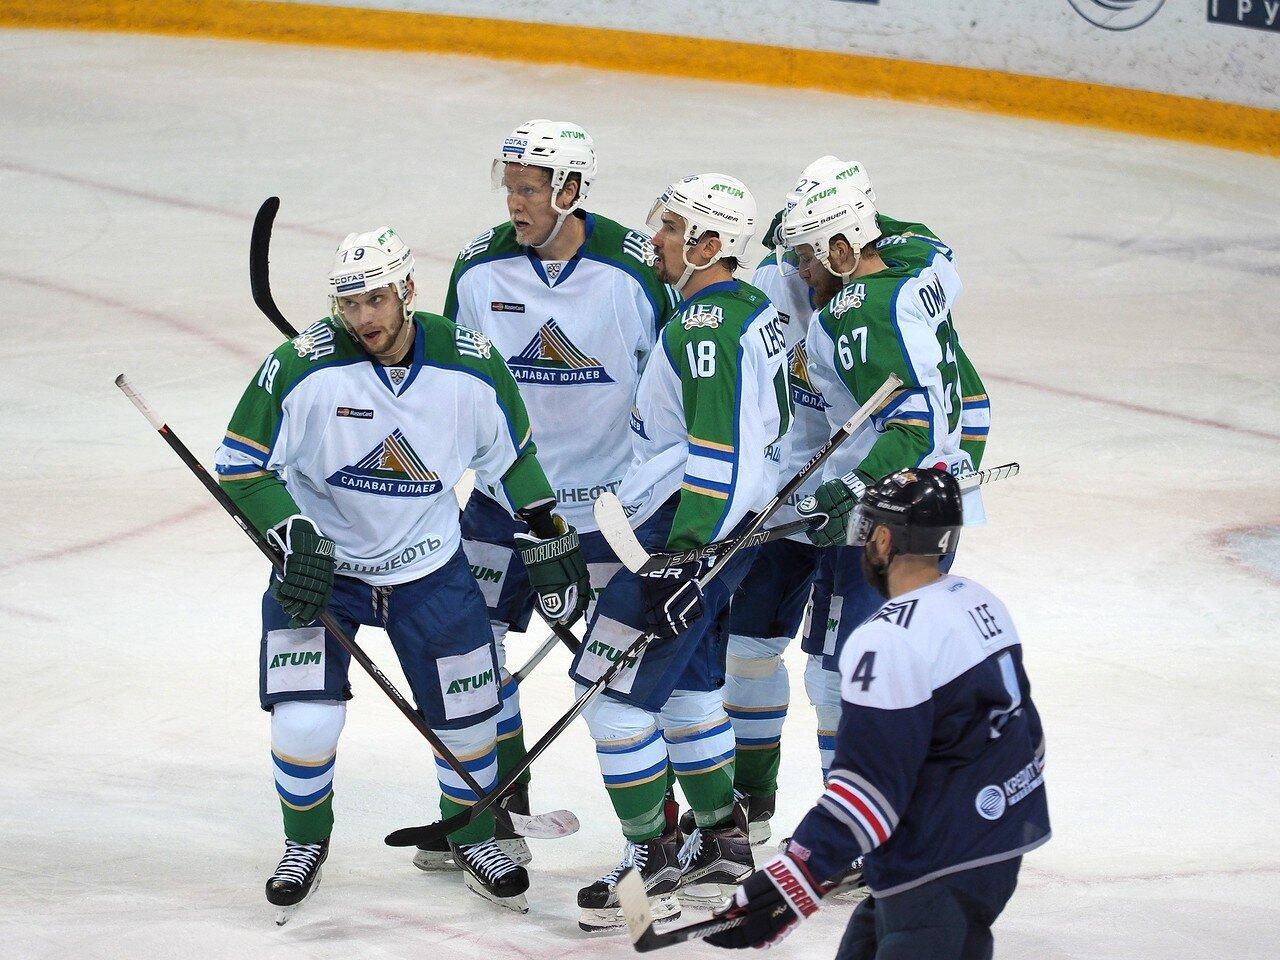 123Плей-офф 2016 Восток Финал Металлург - Салават Юлаев 23.03.2016